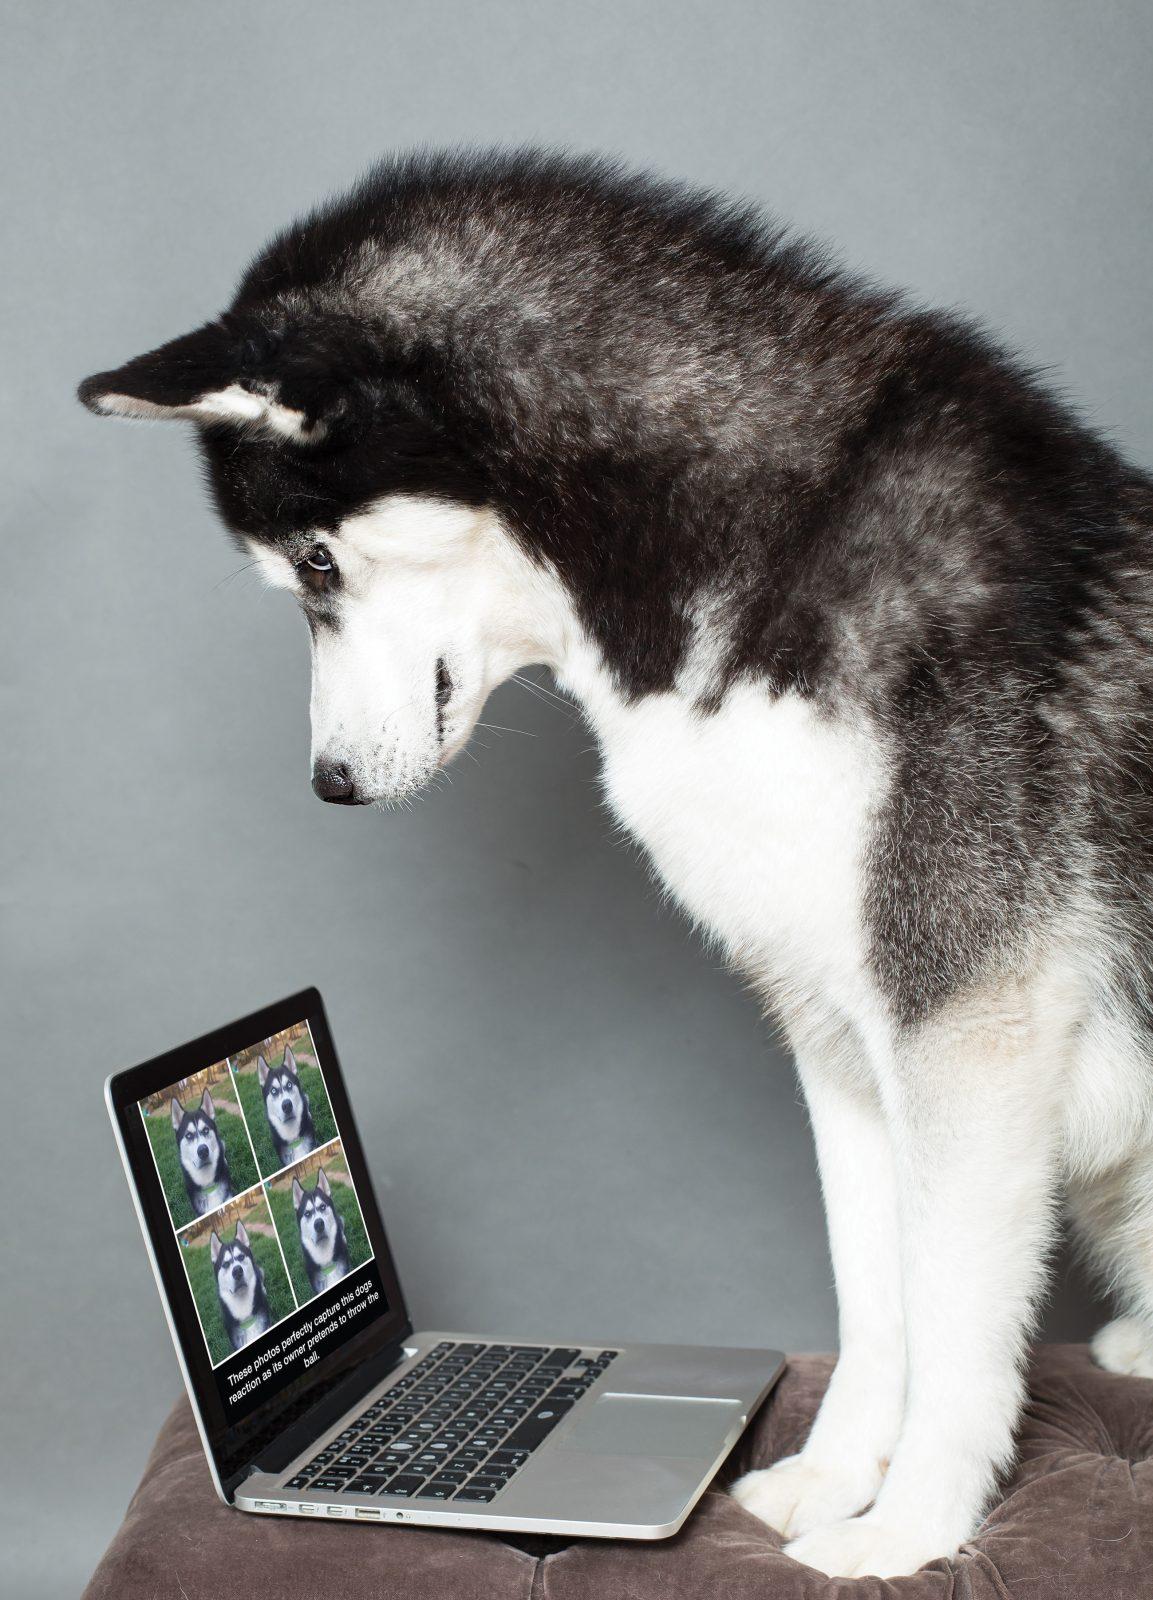 Internet famous! Canine social stars